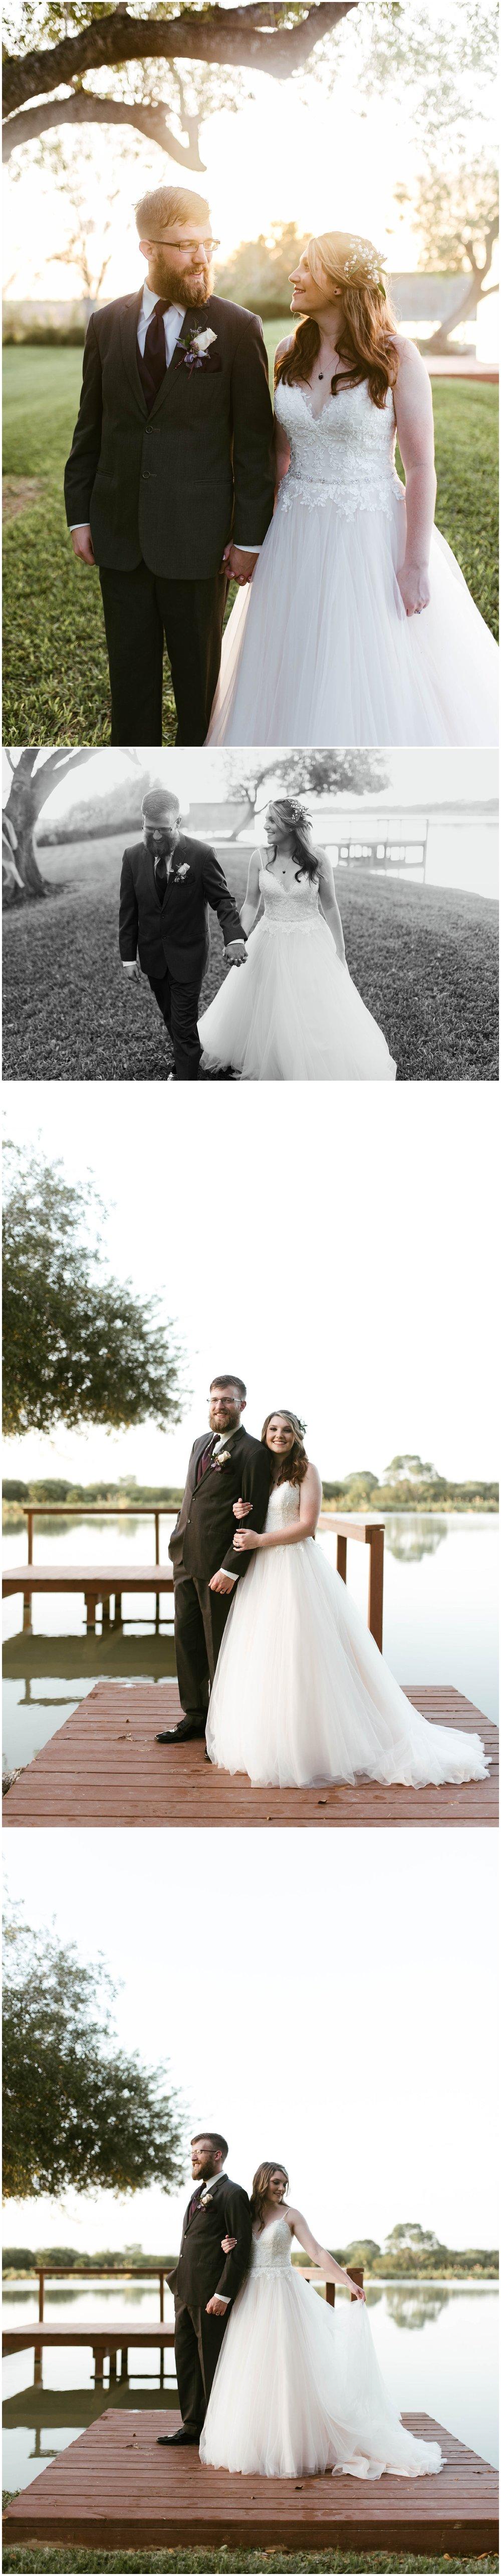 San Benito, Texas Wedding | Houston Natural Light Photographer | Houston Wedding Photographer | www.jordanmitchellphotography.com